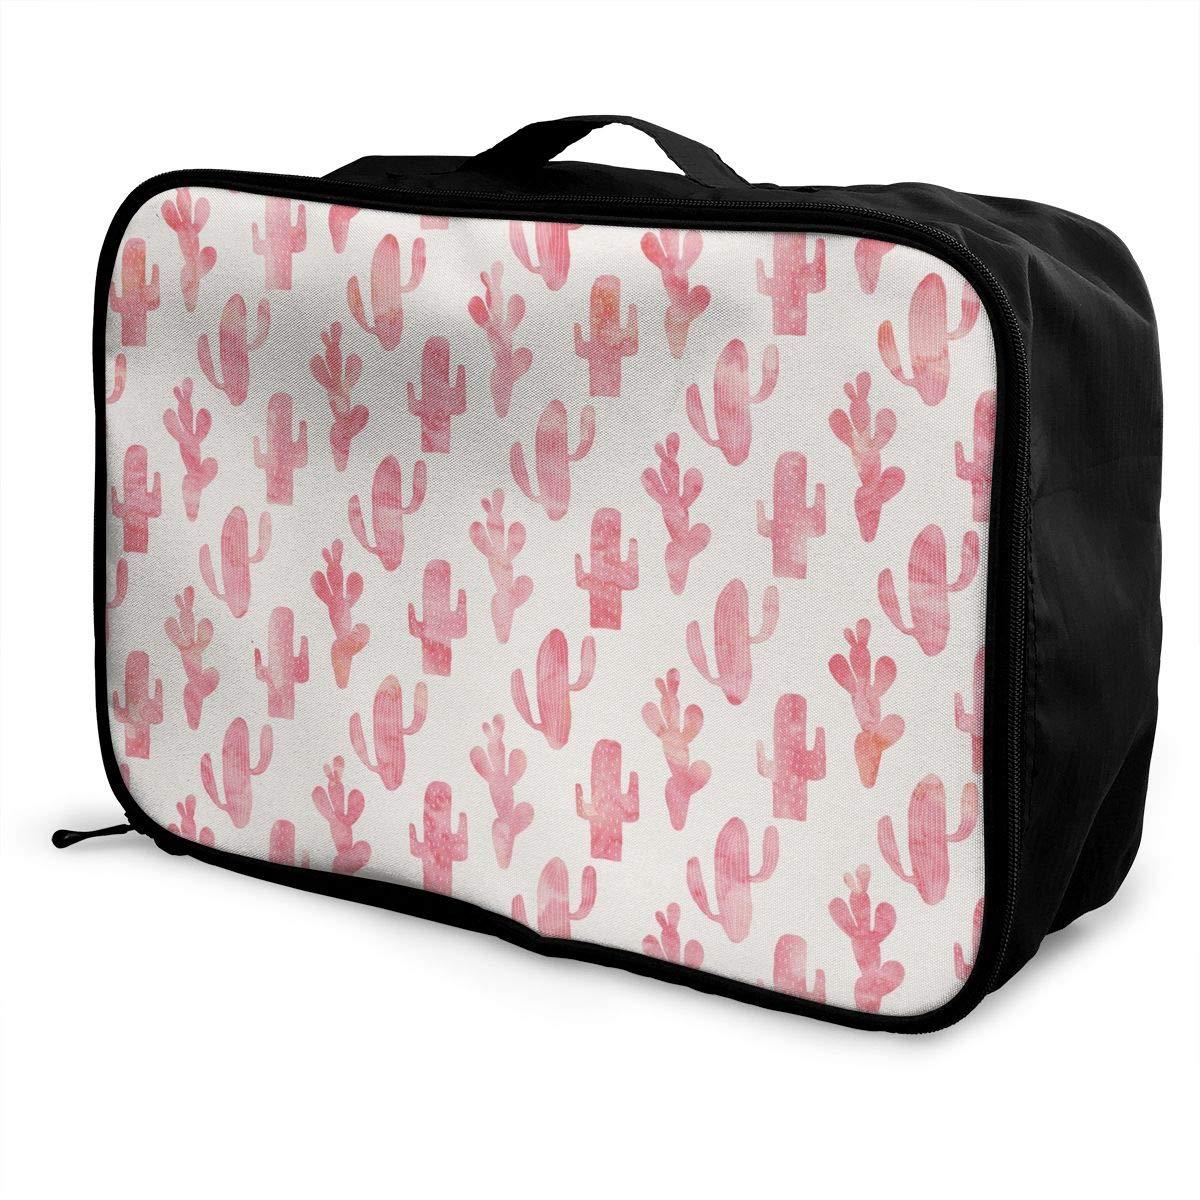 Women /& Men Foldable Travel Duffel Bag Pink Cactus Pattern For Luggage Gym Sports